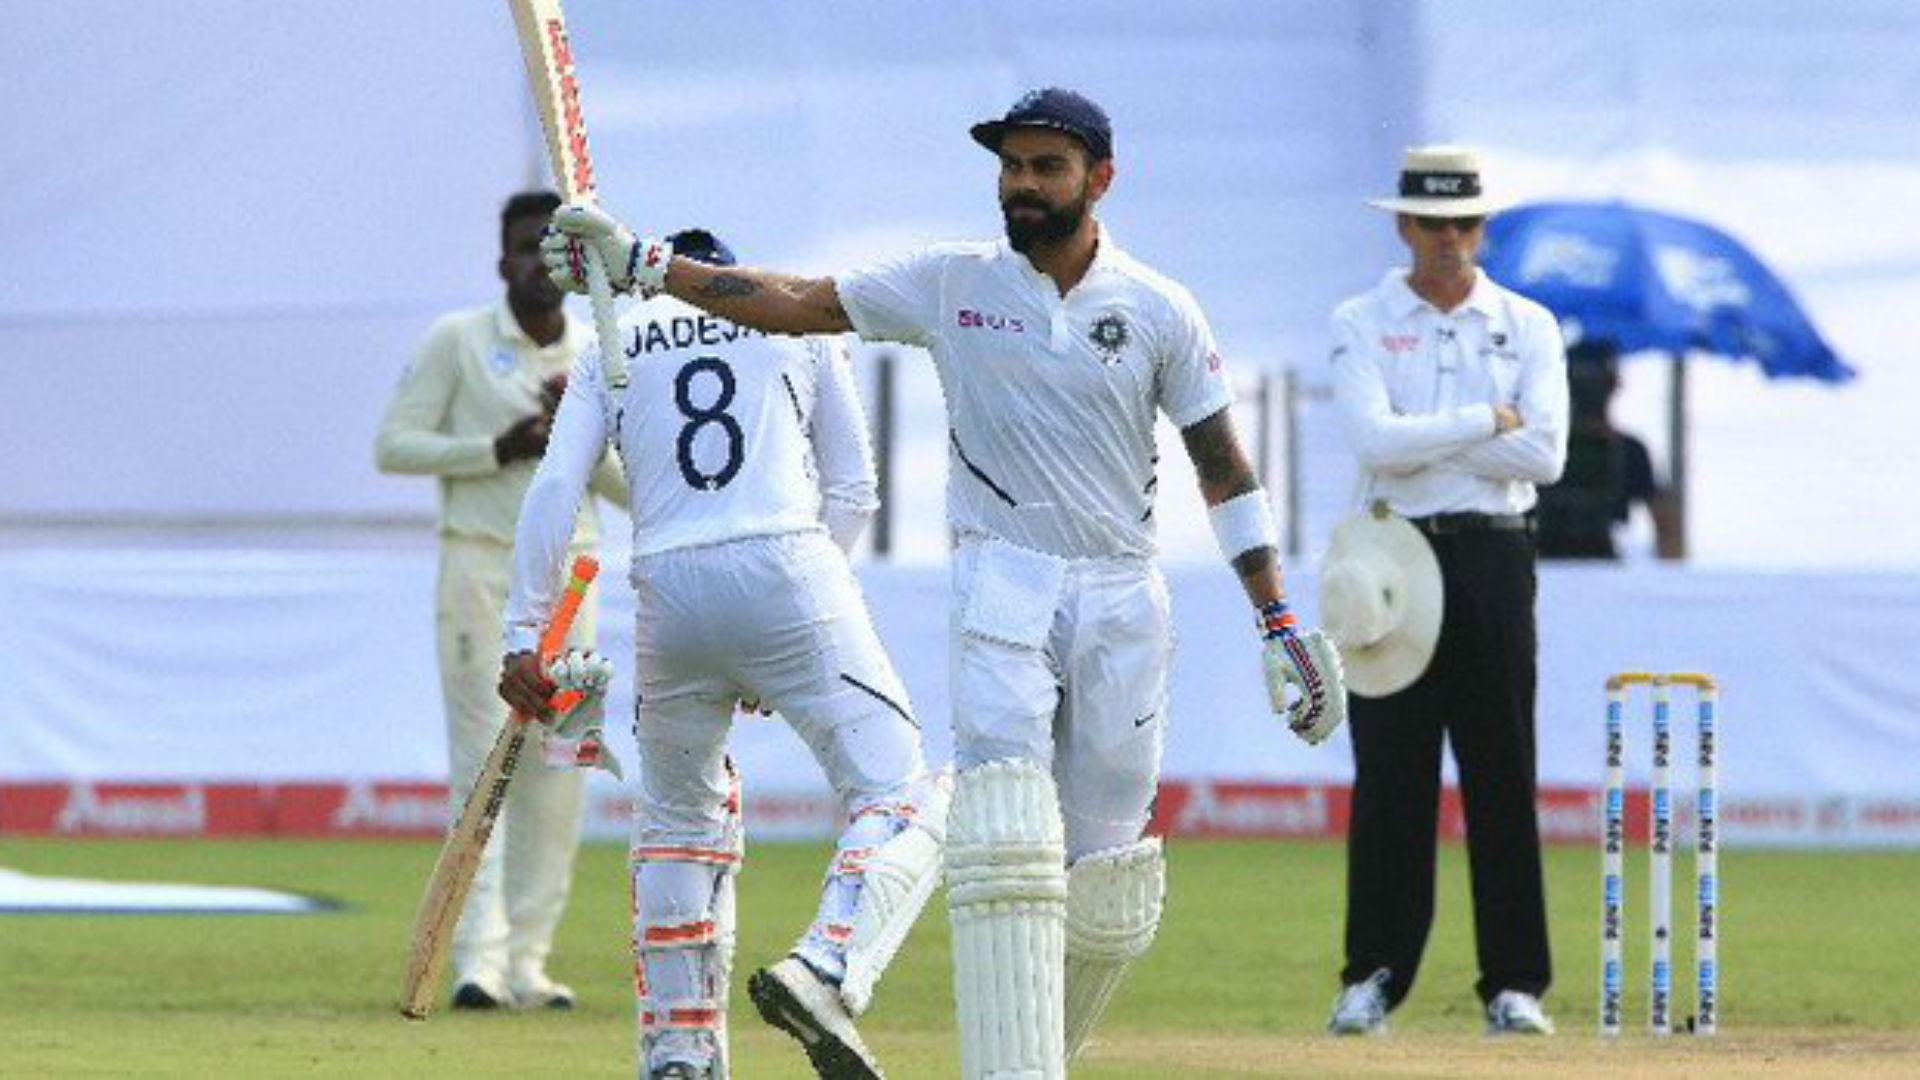 Agarwal hails 'tremendous' Kohli after Pune masterclass